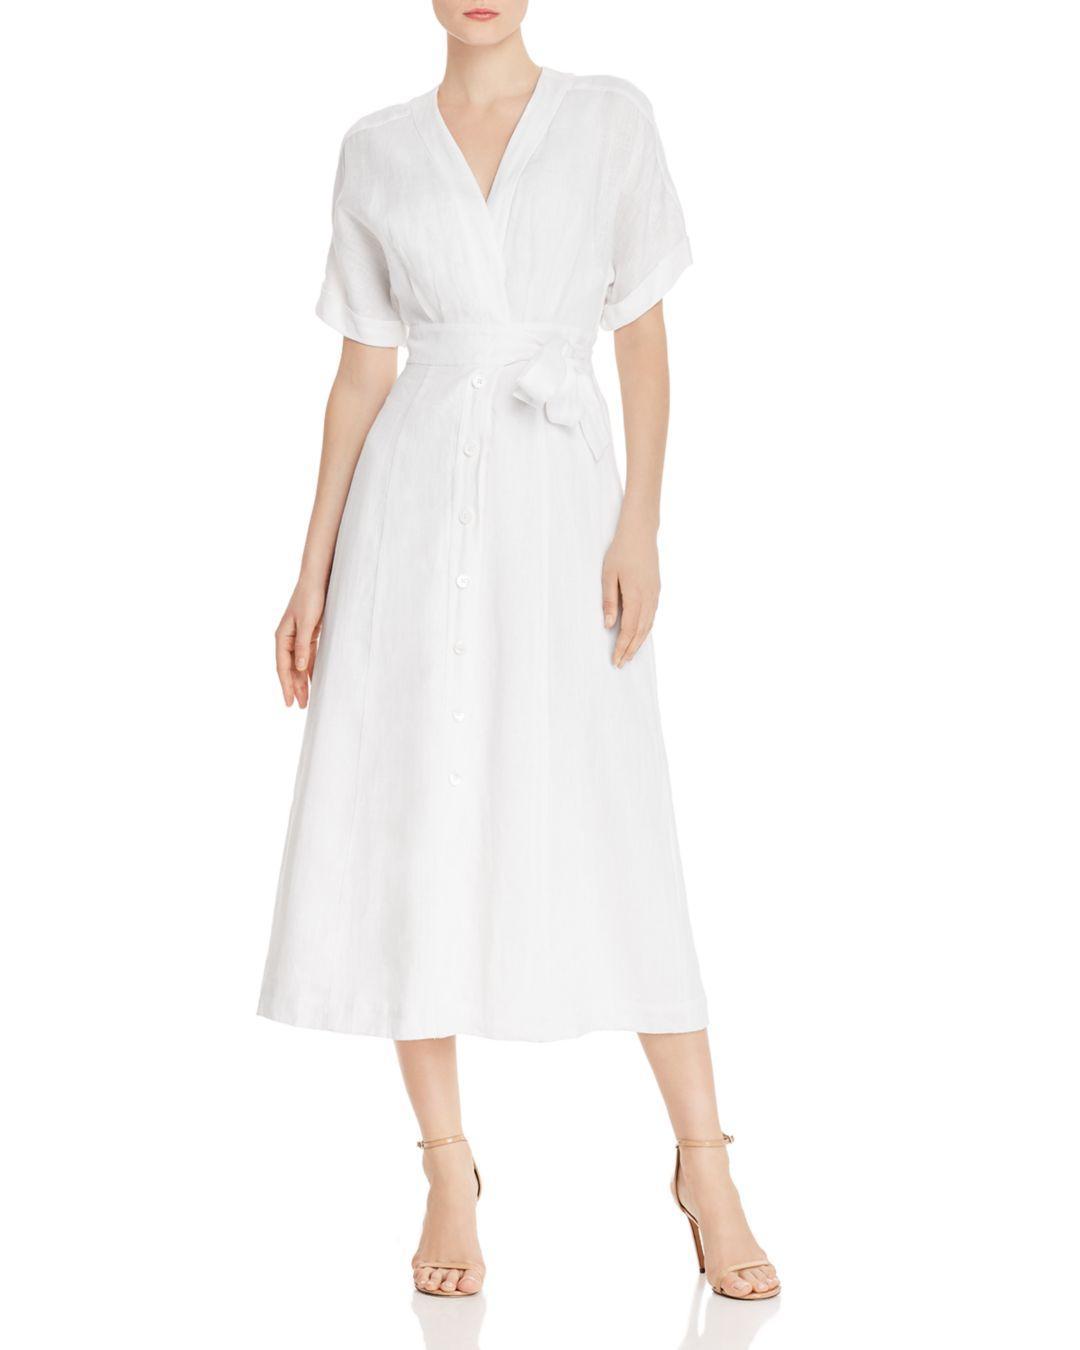 0d7588ab3c Lyst - Equipment Nauman Linen Maxi Dress in White